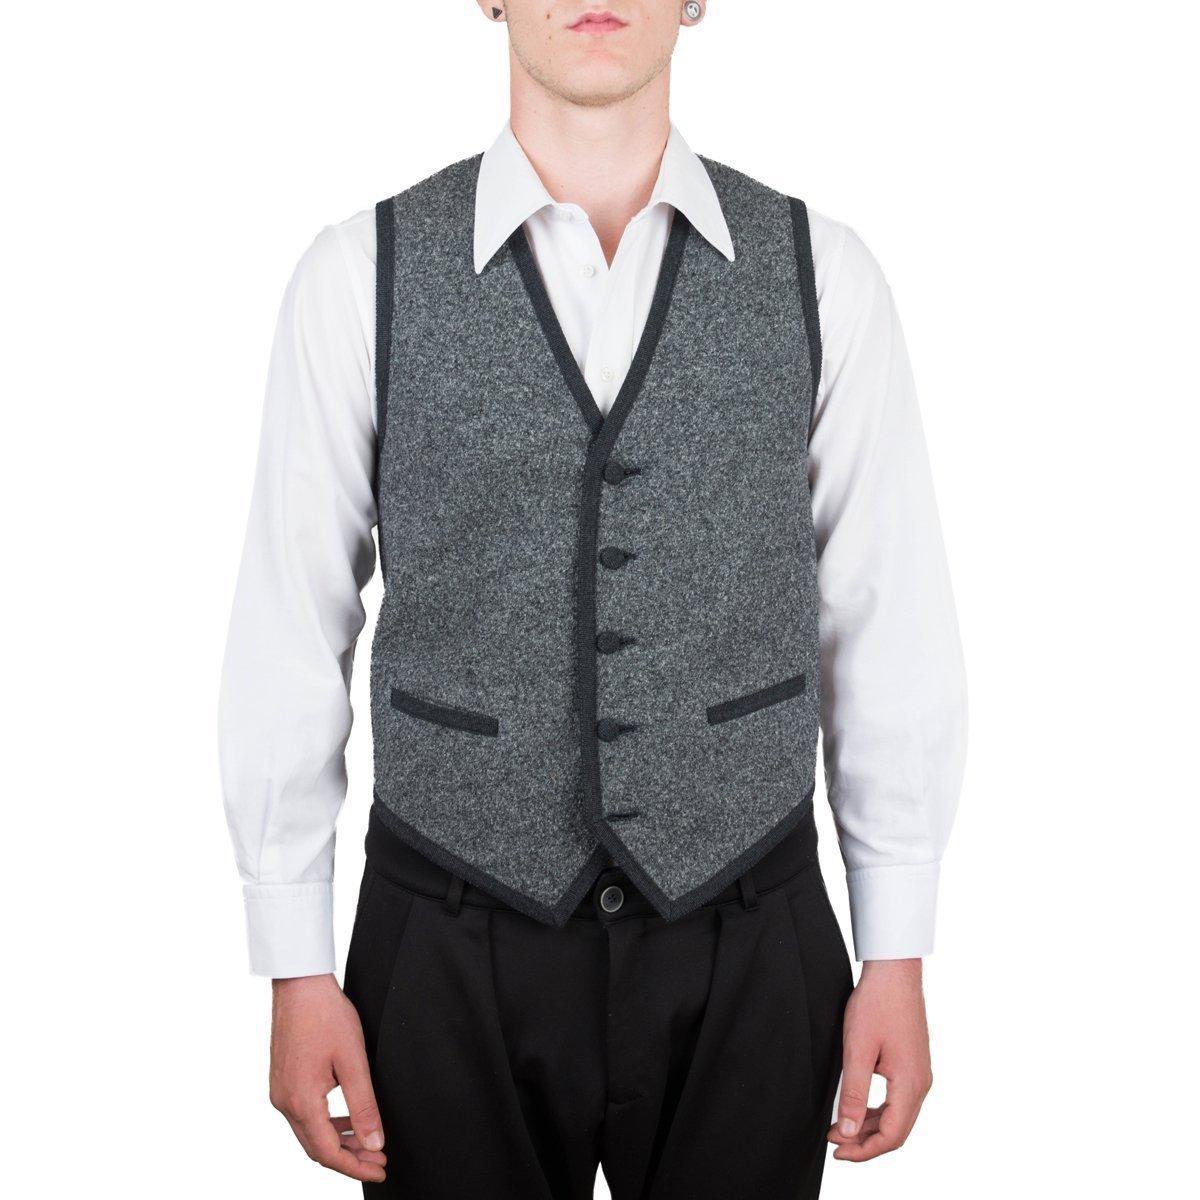 Vest, Gilet, Waistcoat, Knitwear, Men, Boy, Black, Grey, Brown, Melange, Tailored, Wool, Buttons, Pockets, Casual, Business, Formal, Sleeveless, Italian Fabric, Italian Style, Made in Italy, Handmade